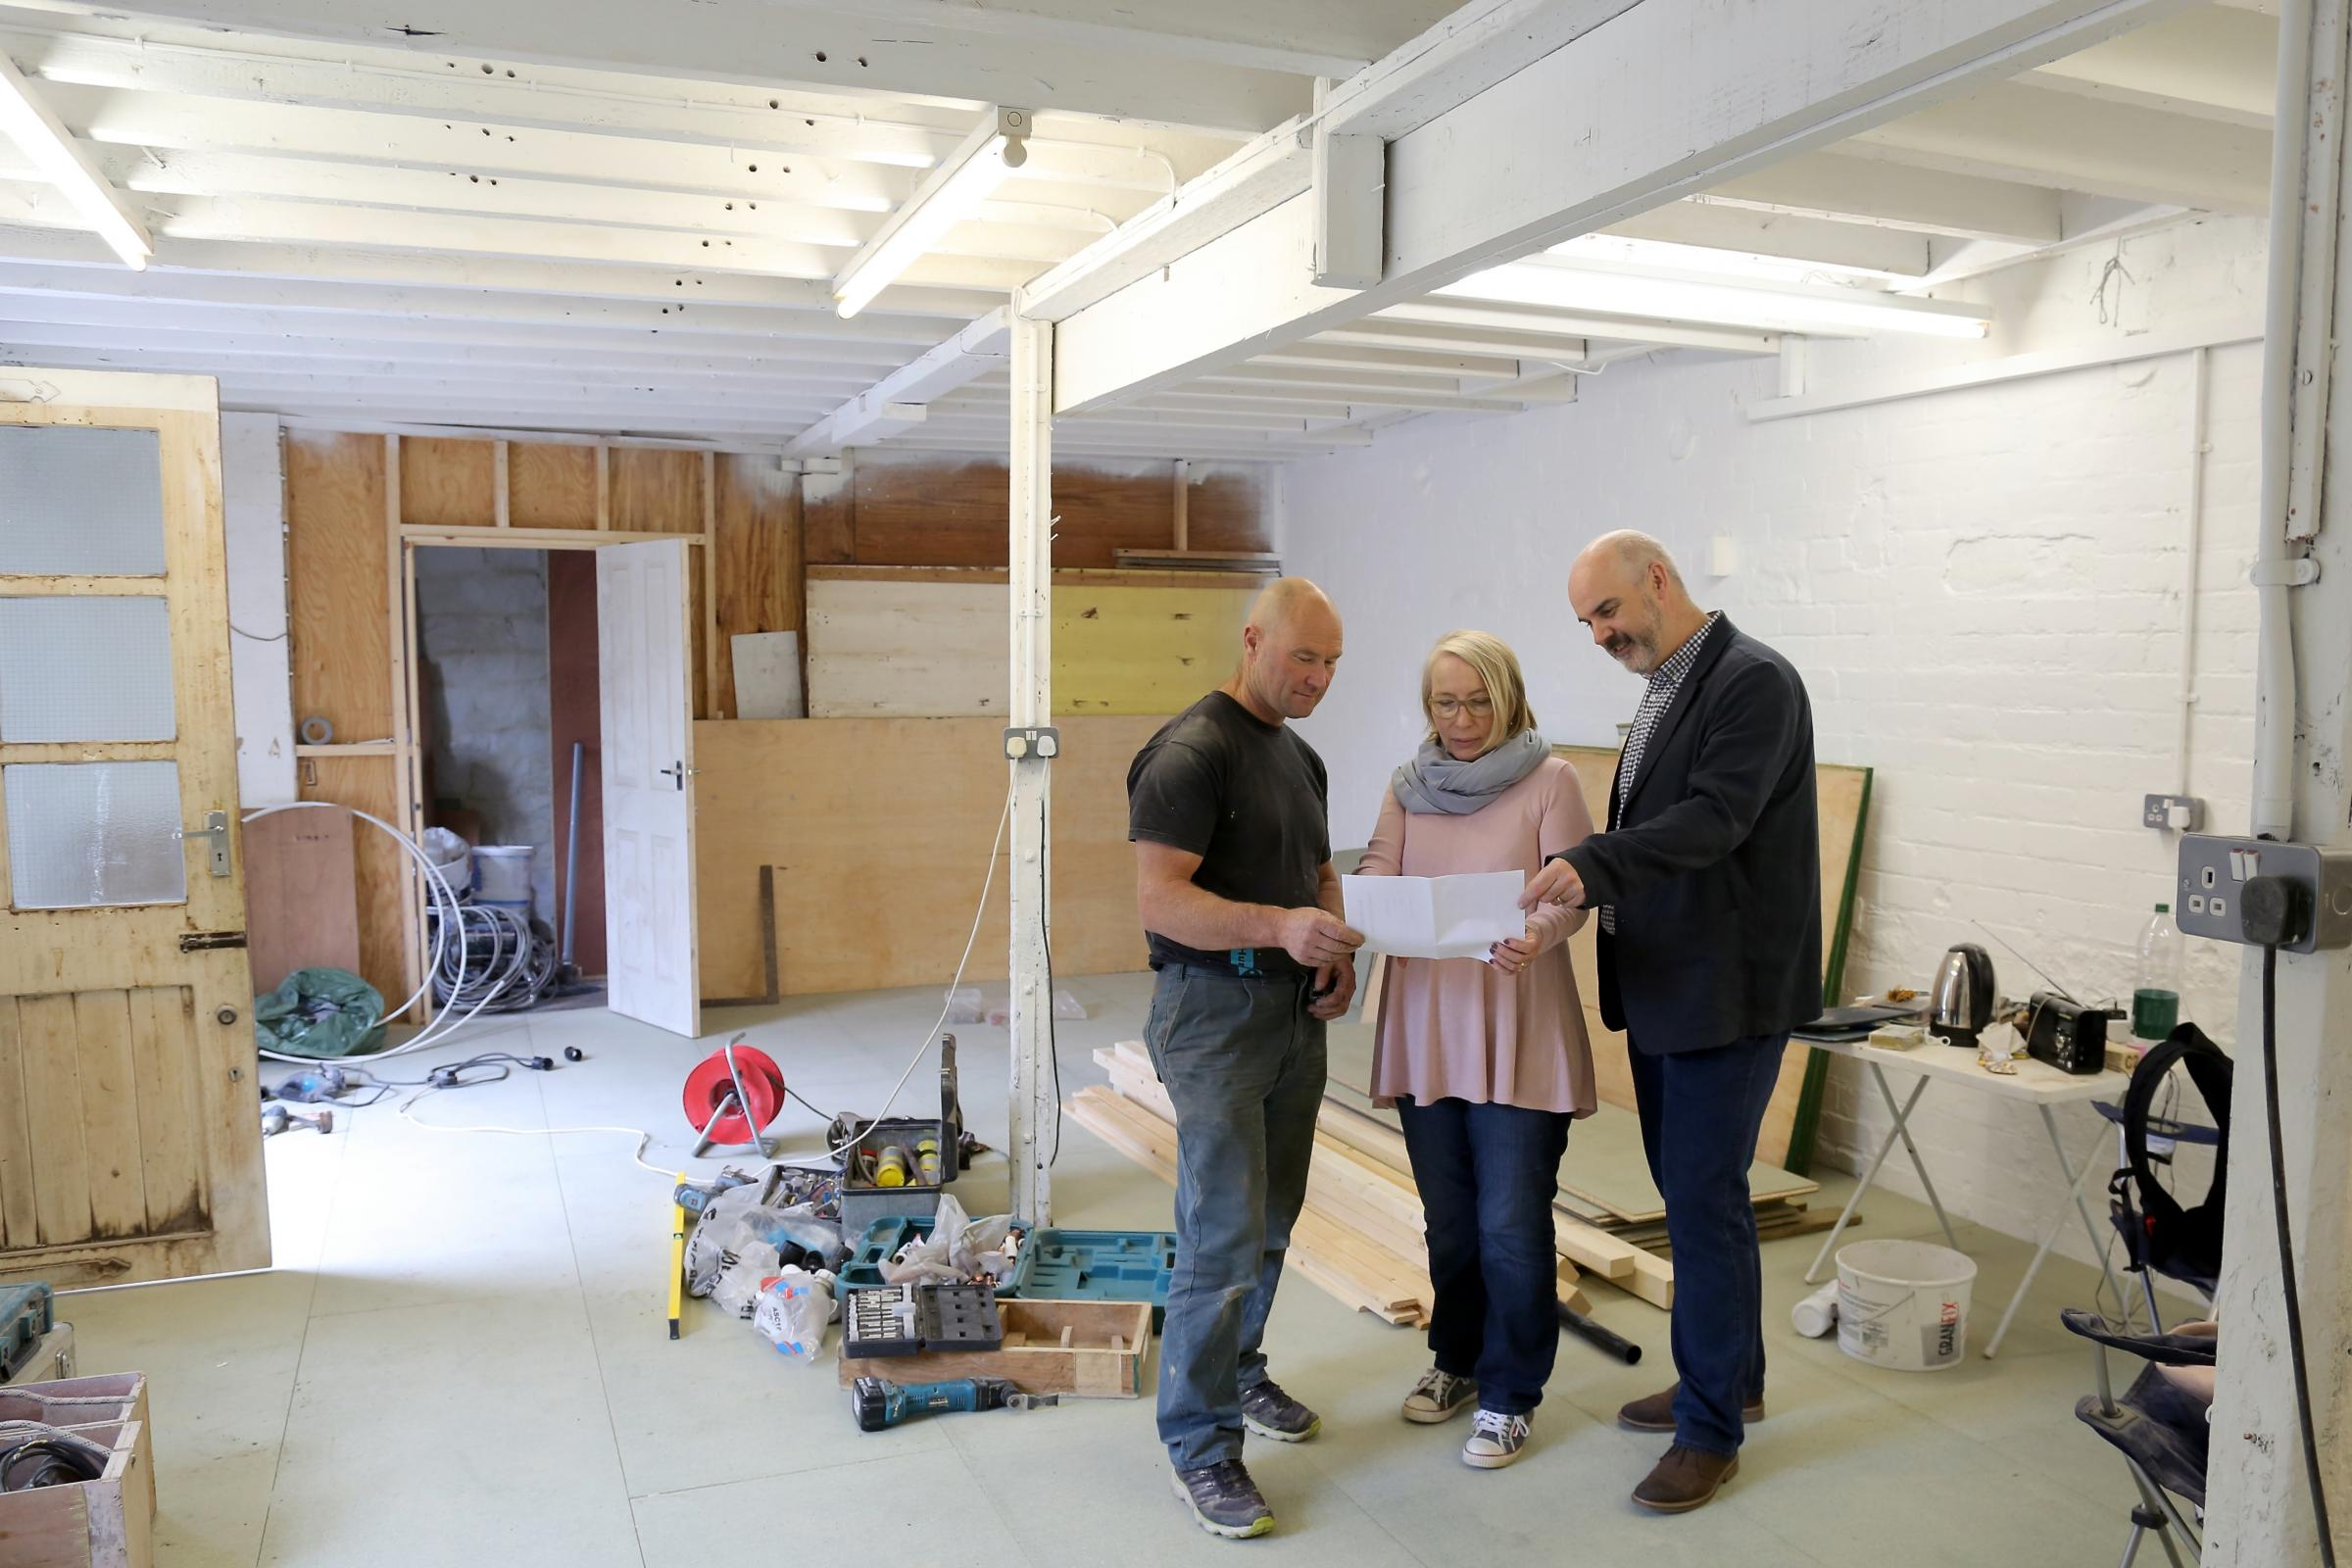 Bradford School of Art and Ilkley Art Trail developing creative